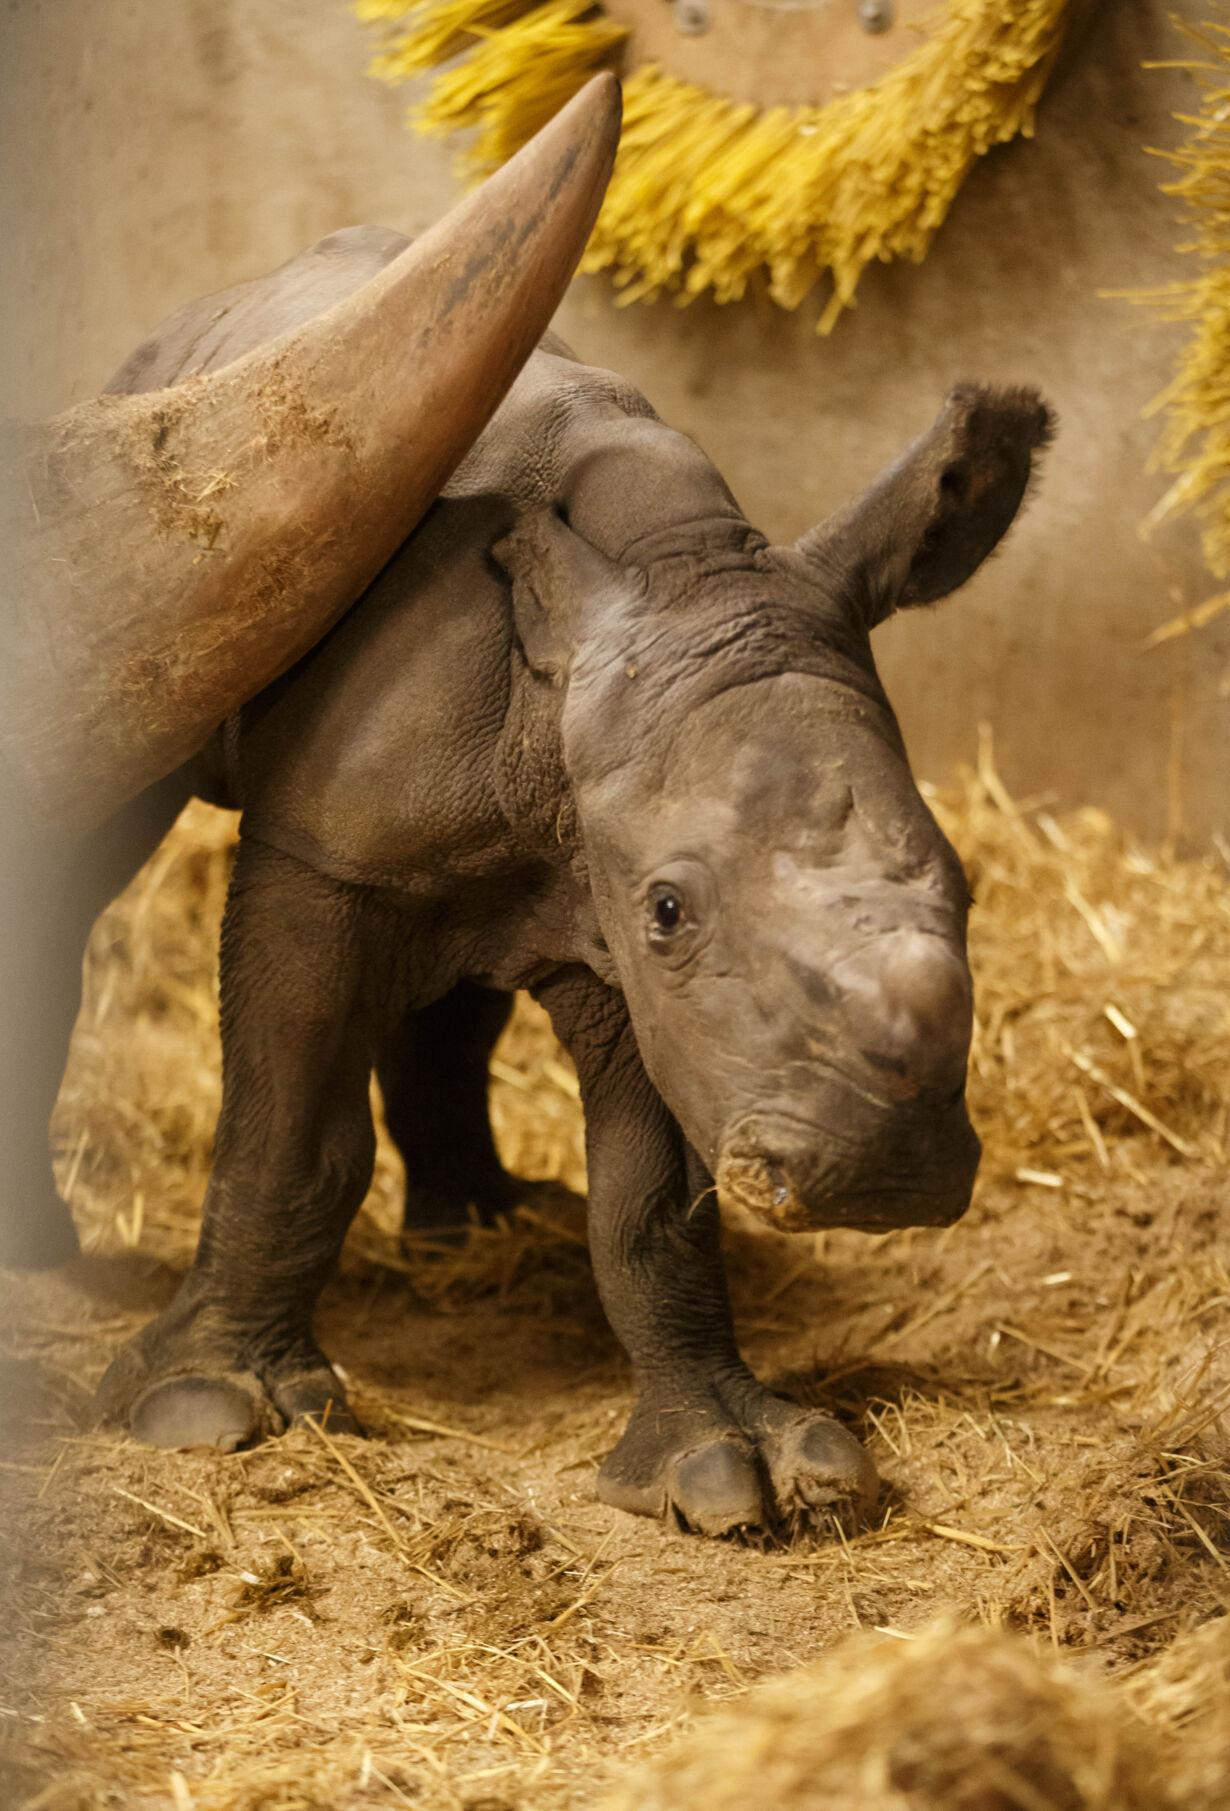 Nyfødt næsehornsunge 35